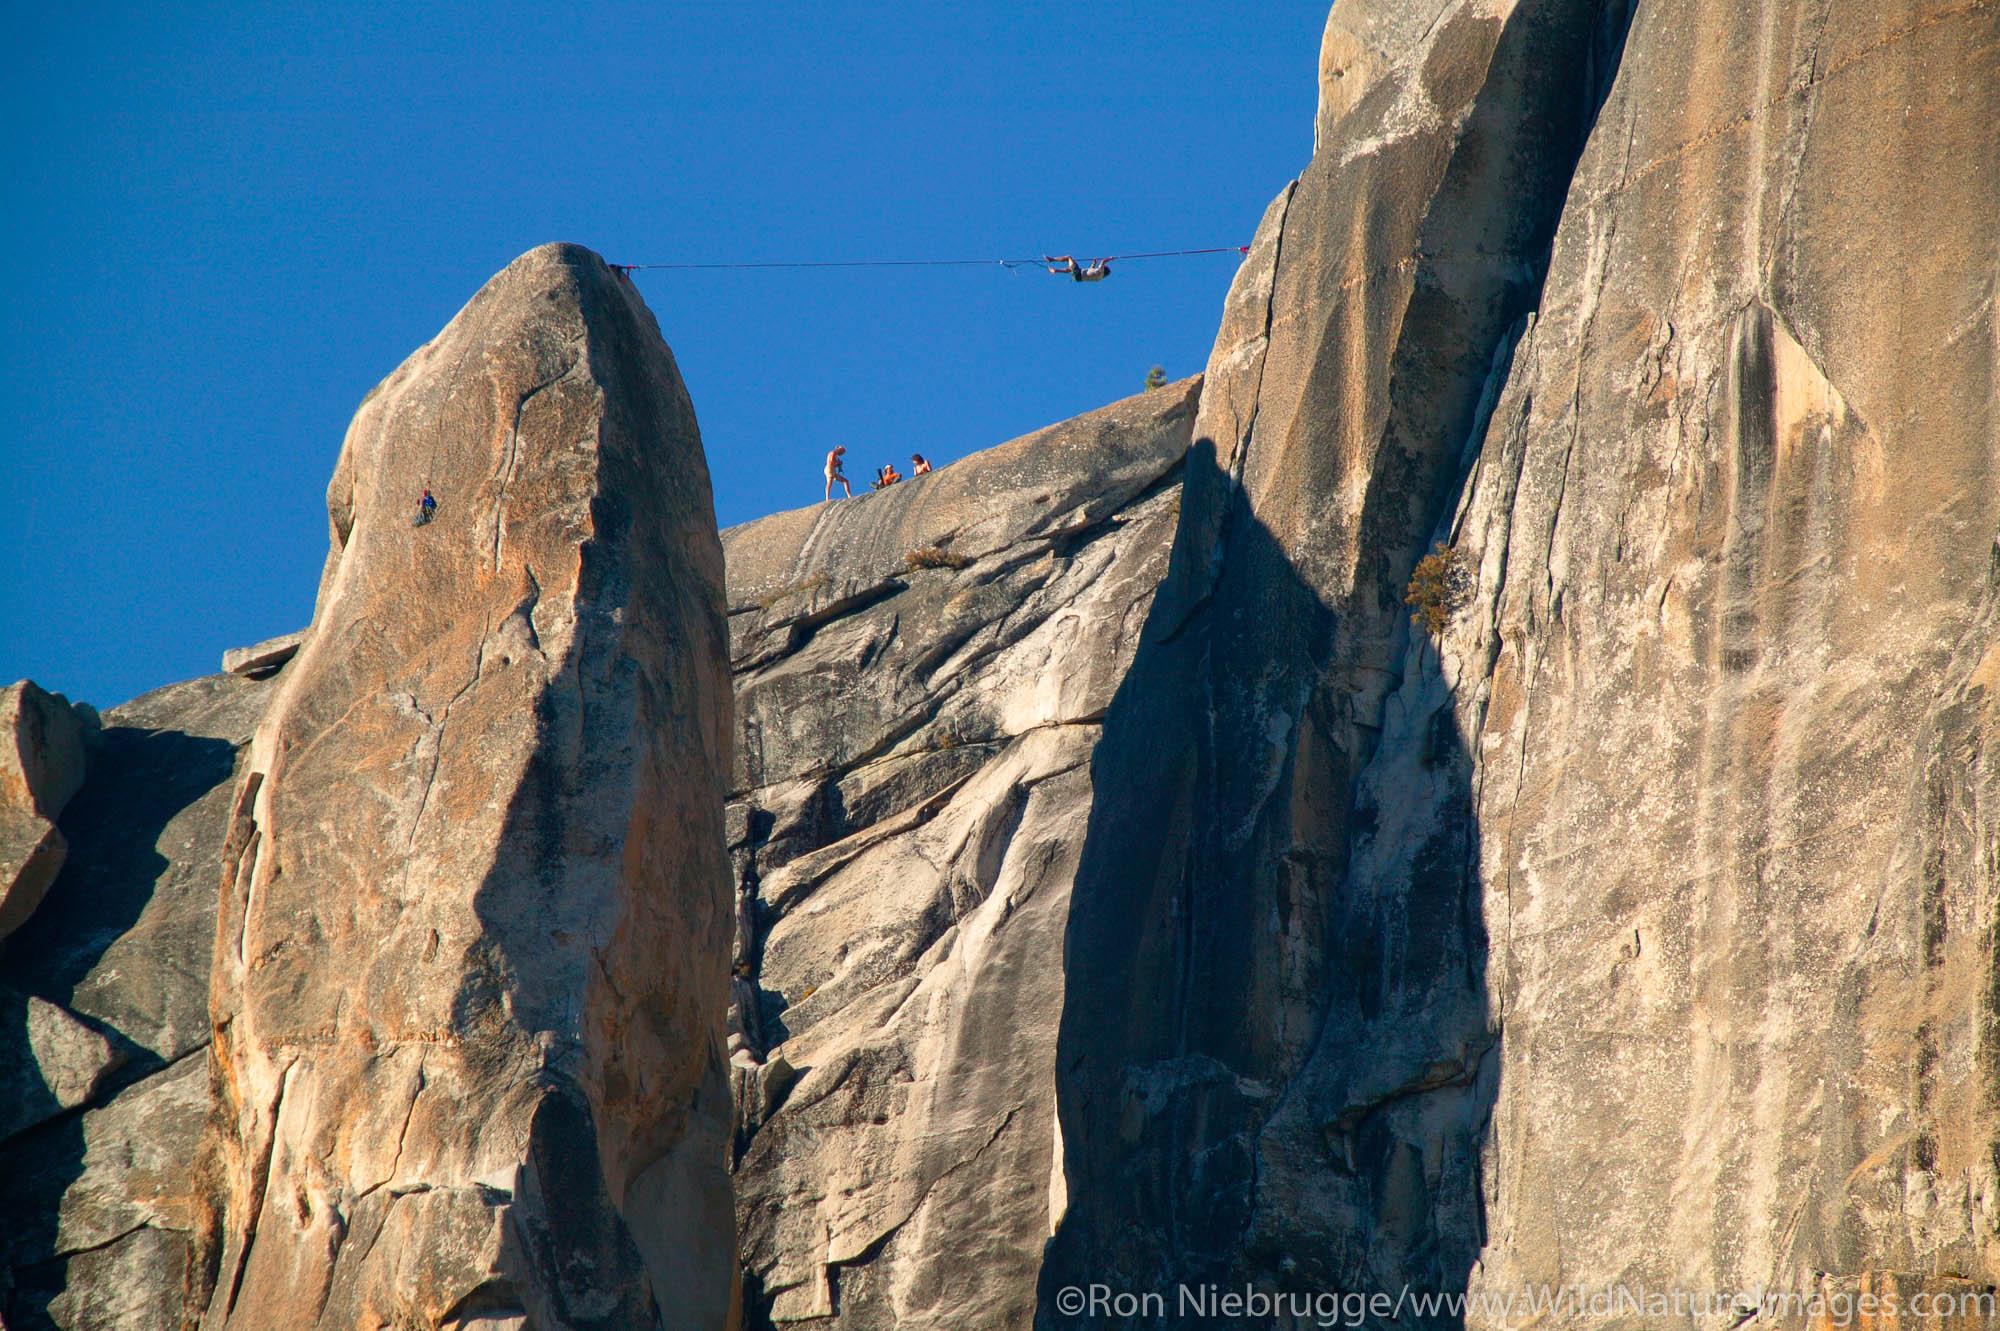 Climbers executing a tyrolean traverse  high above Yosemite Valley, Yosemite National Park, California.